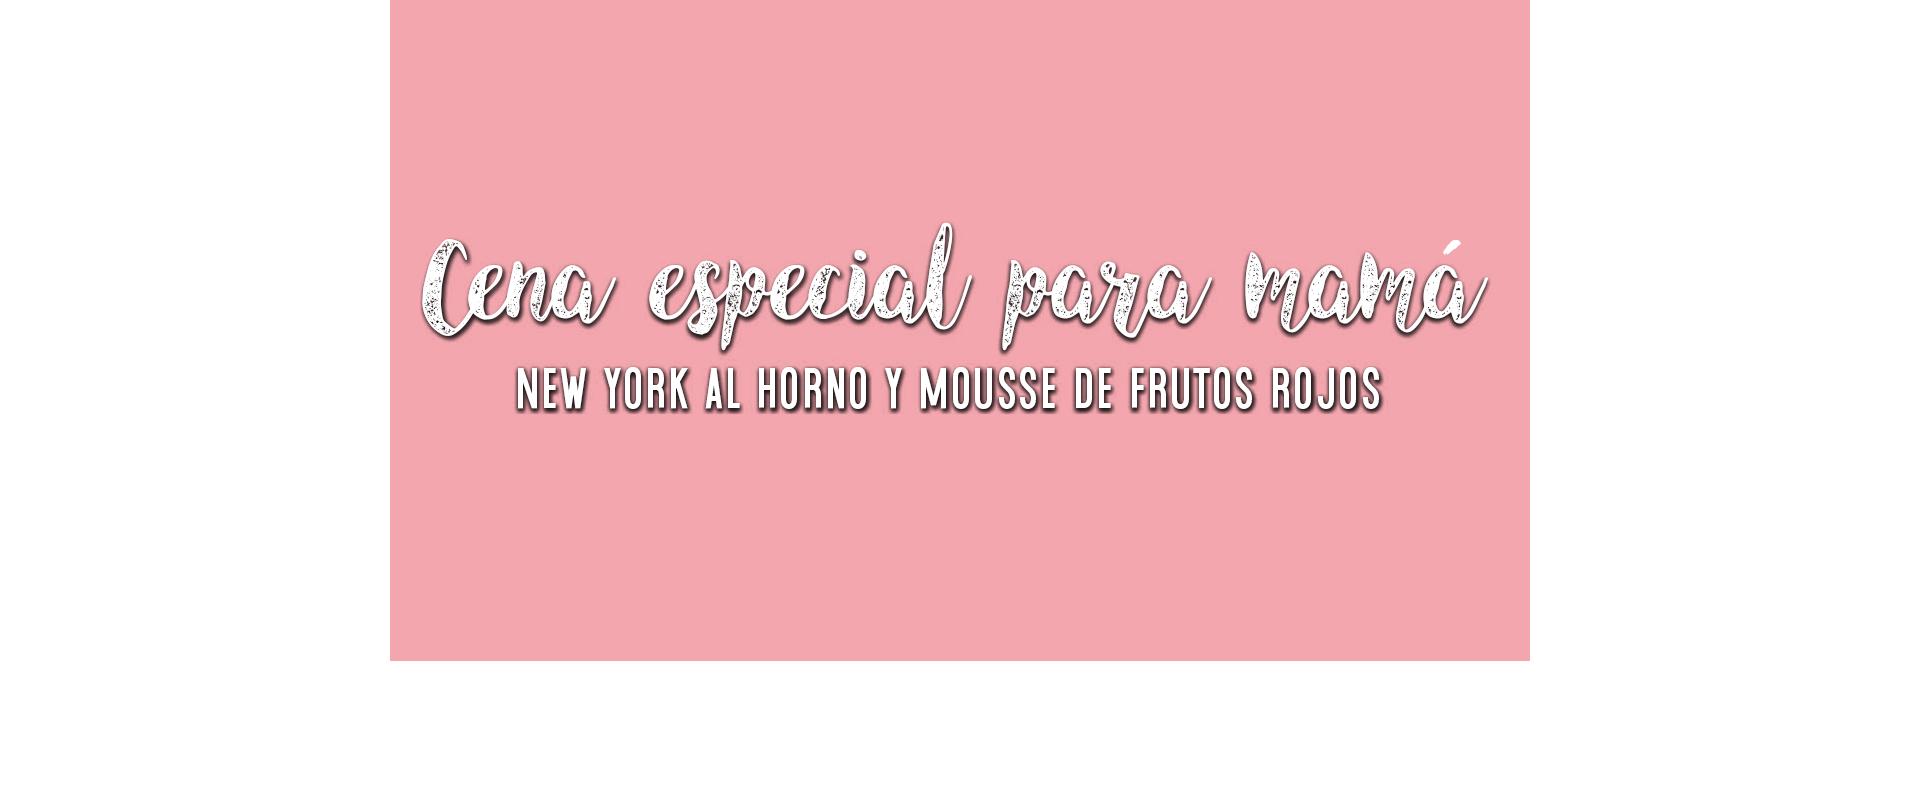 Cena especial para mamá, New York al horno y Mousse de frutos rojos